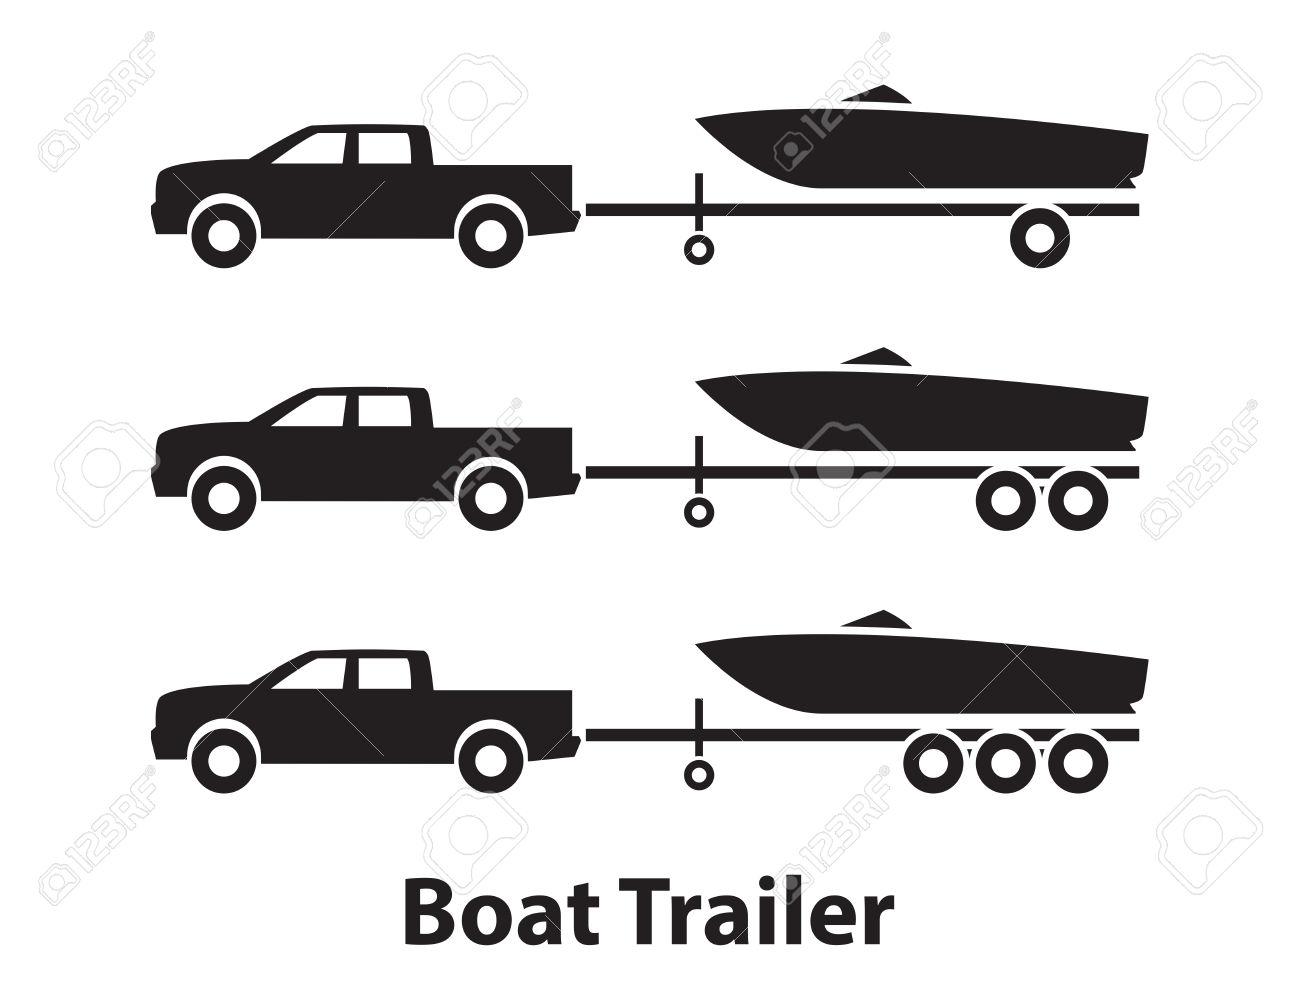 Boat Trailer Clipart